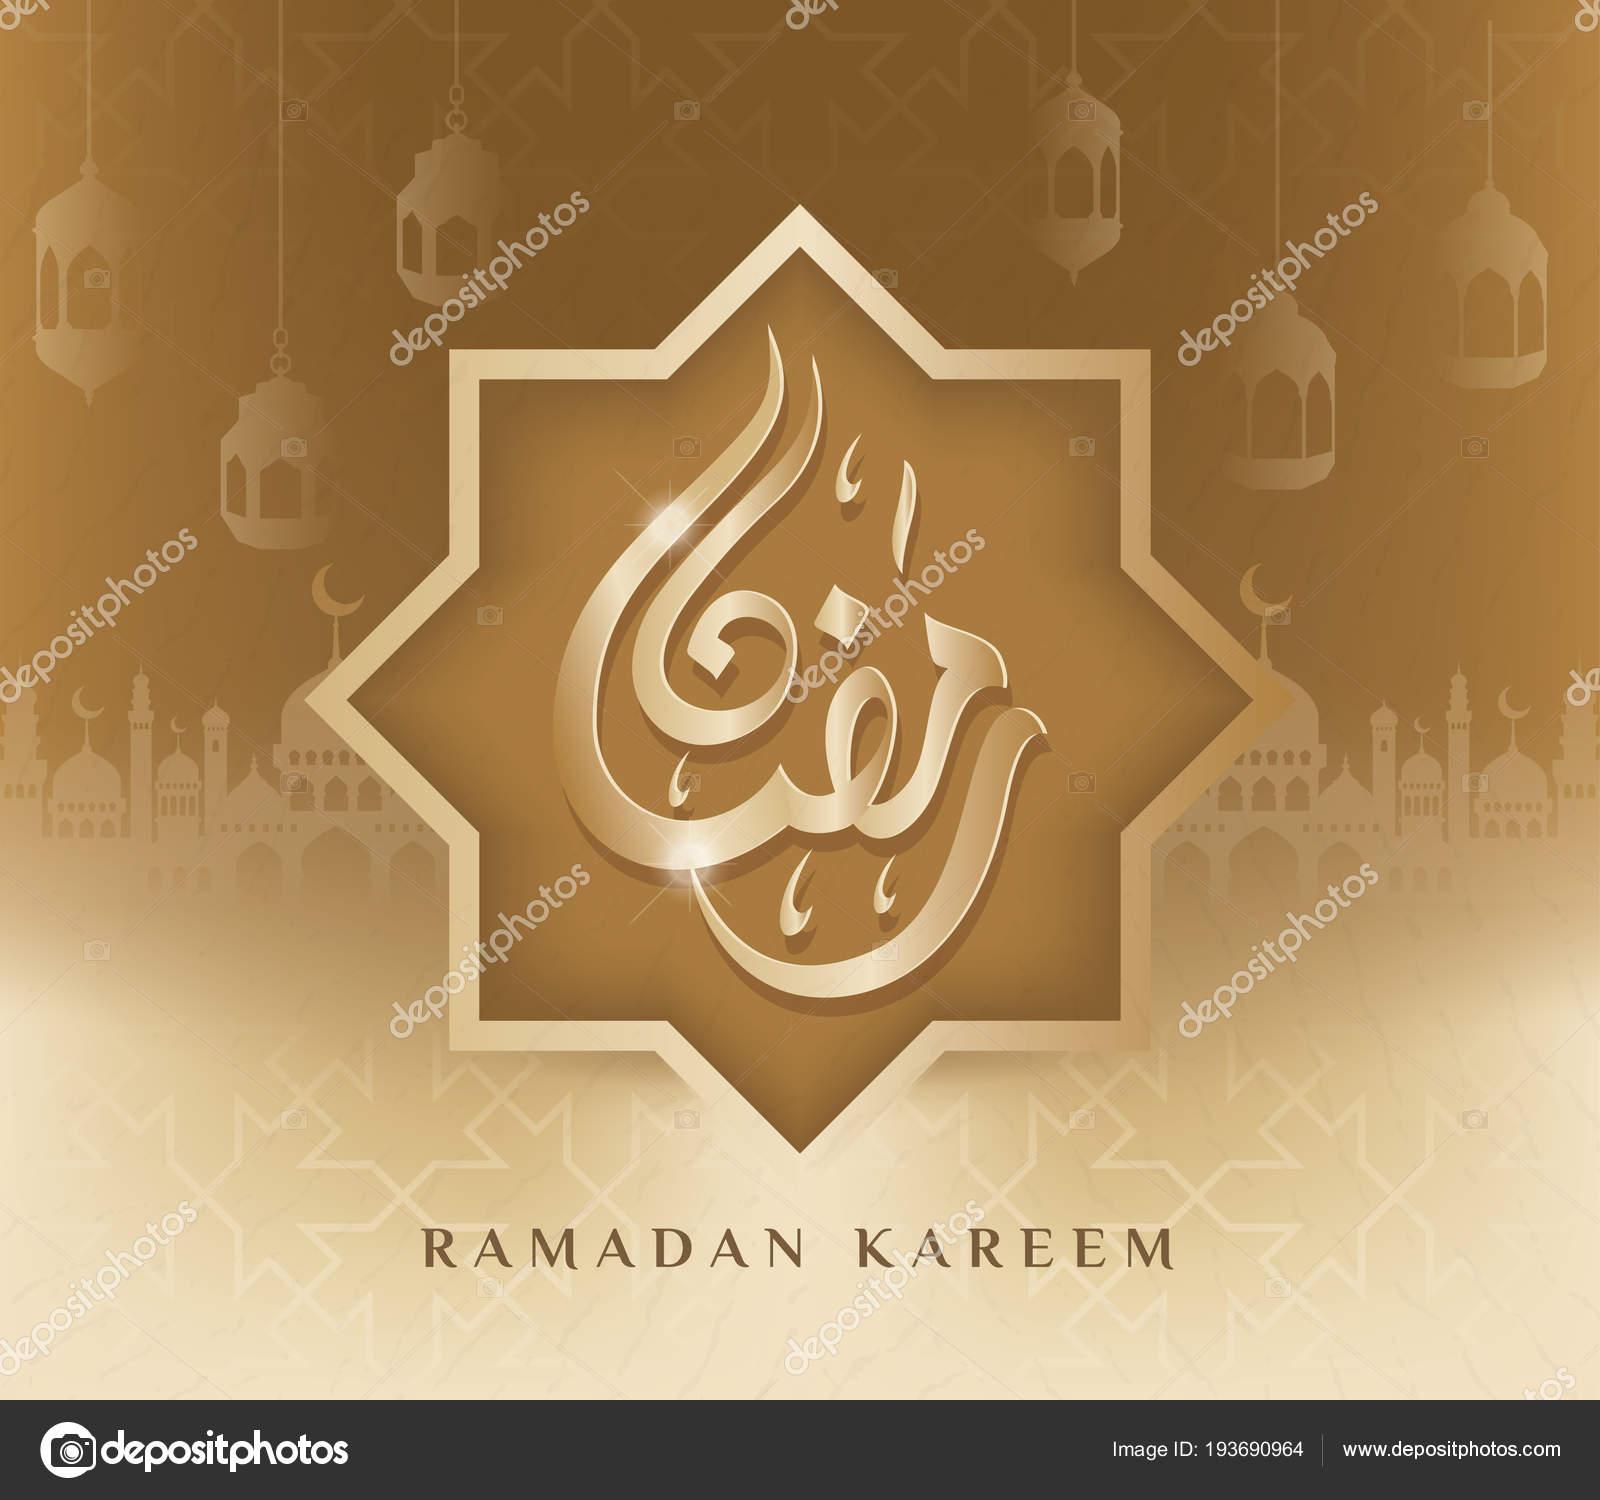 Ramadan kareem islamic greeting arabic pattern mosque stock vector ramadan kareem islamic greeting arabic pattern mosque stock vector m4hsunfo